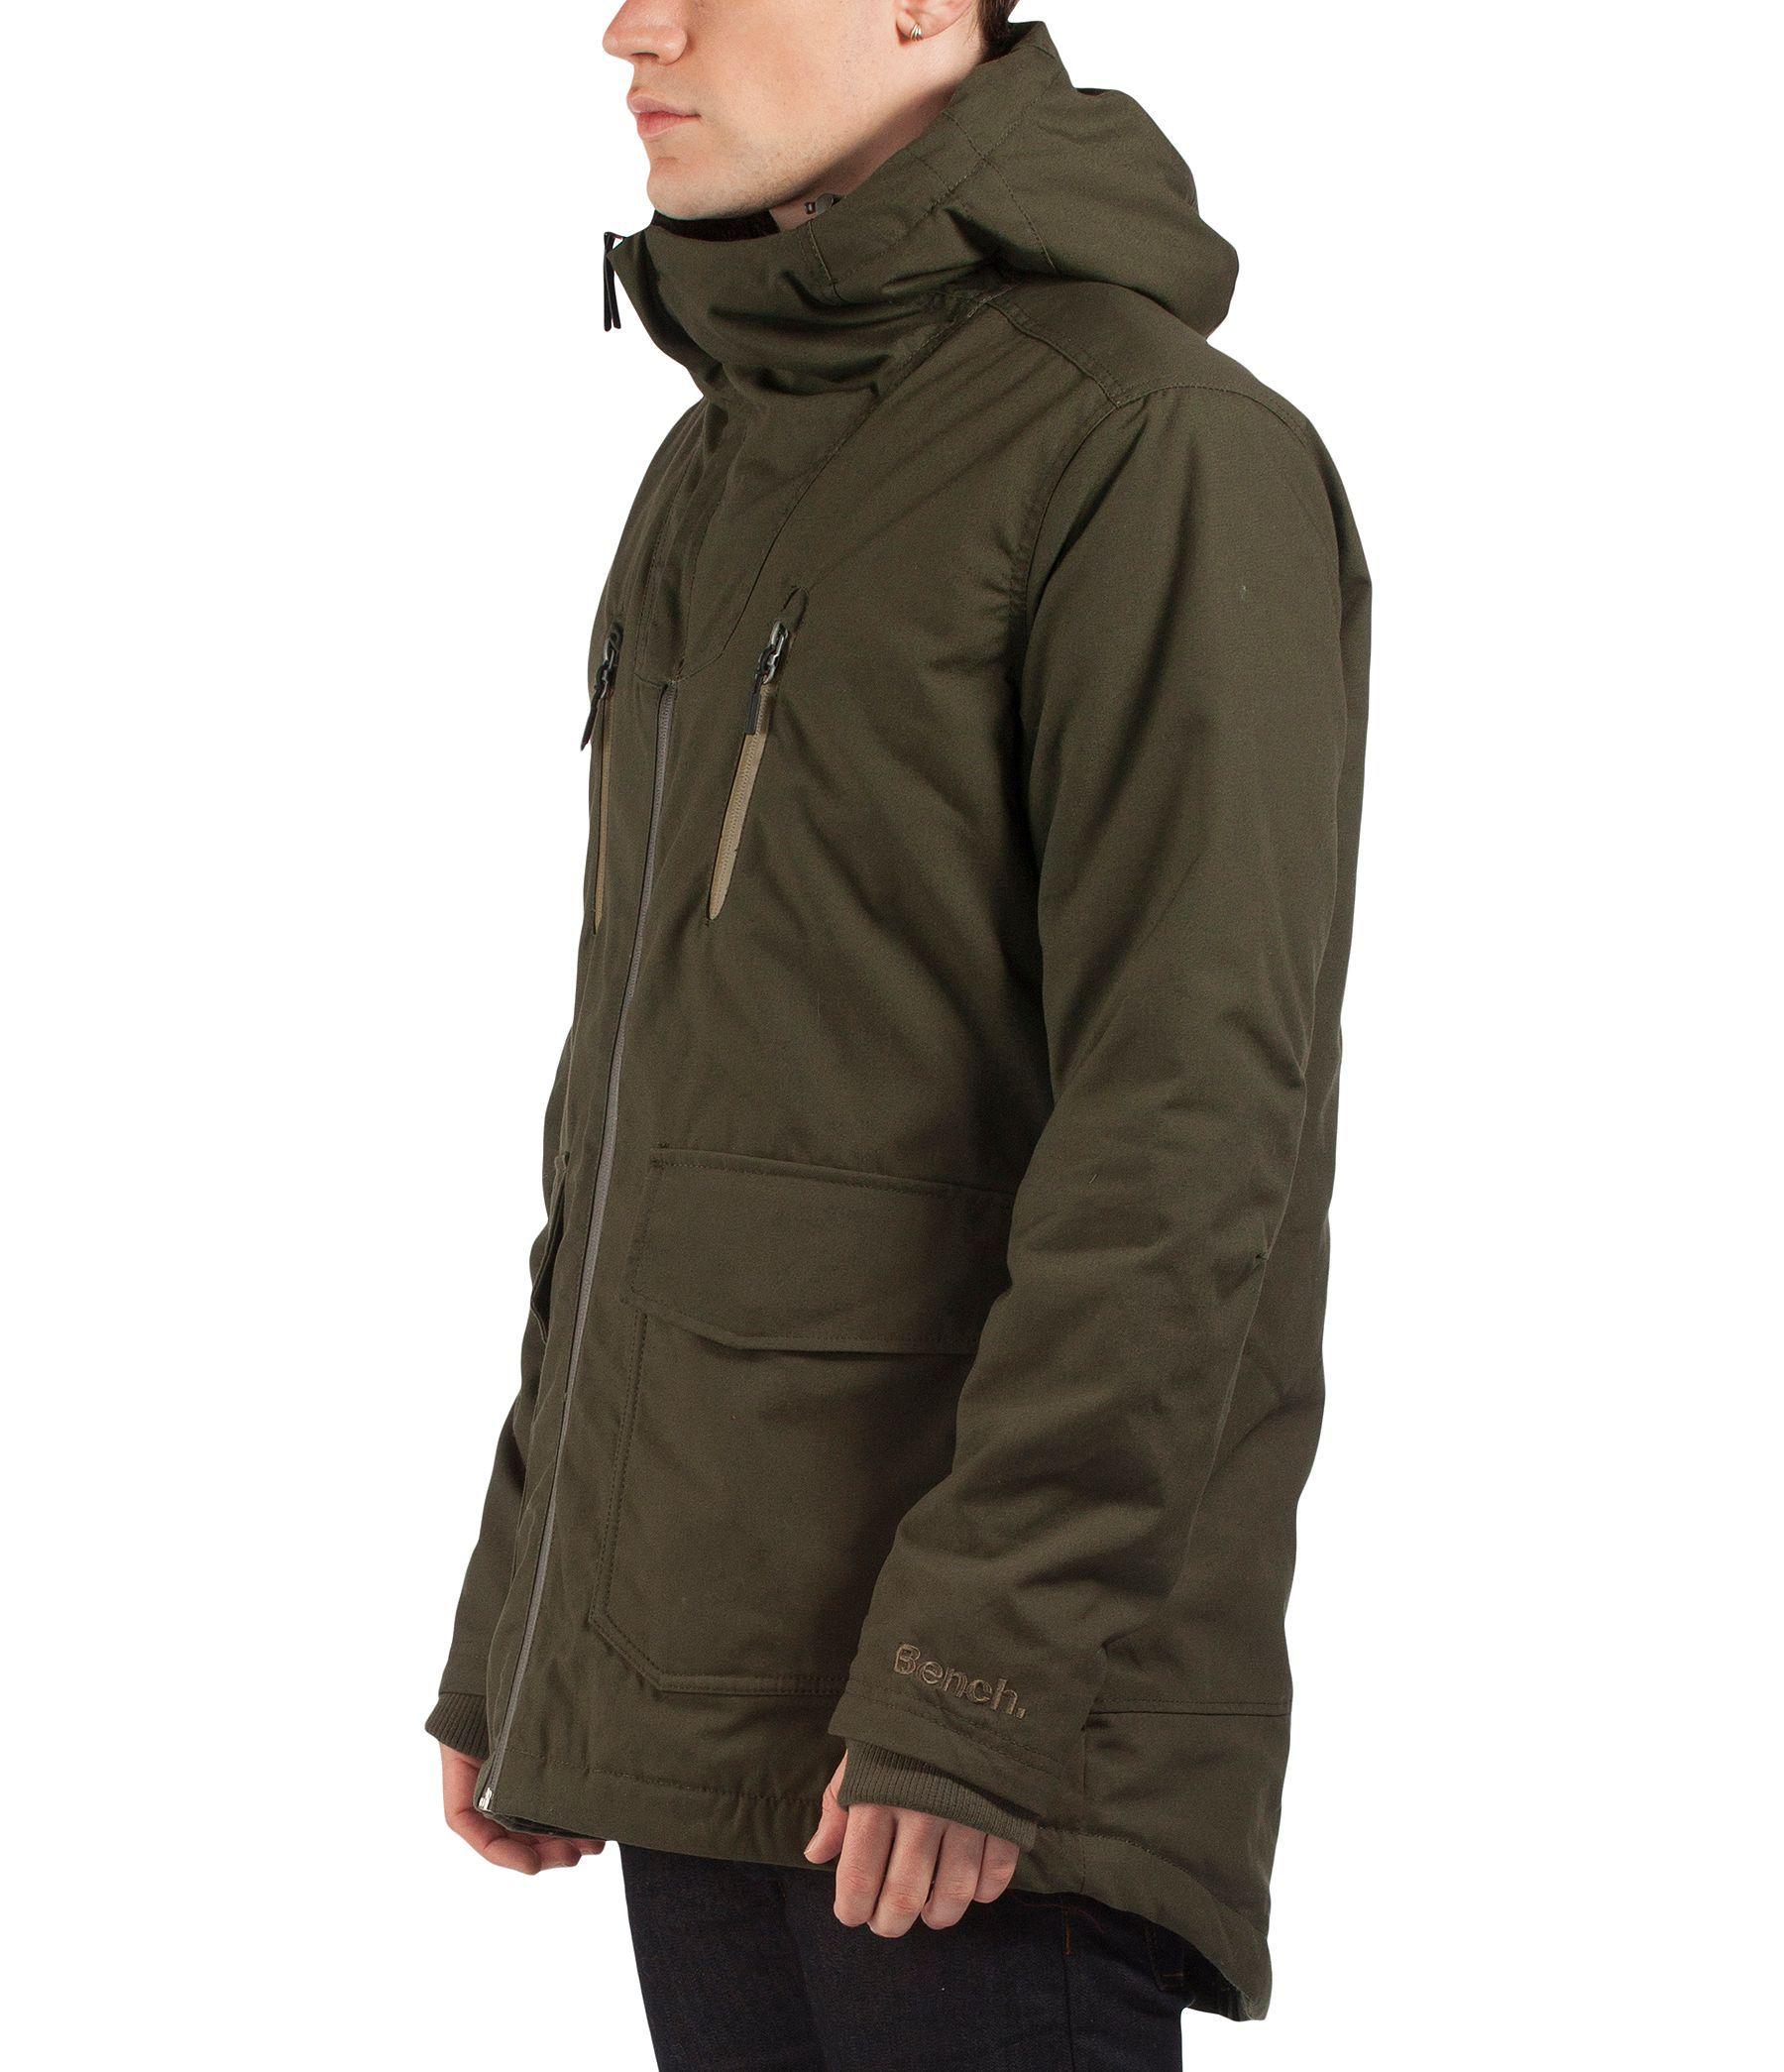 Bench apploud b long zip thru hooded parka jacket in green Bench jacket